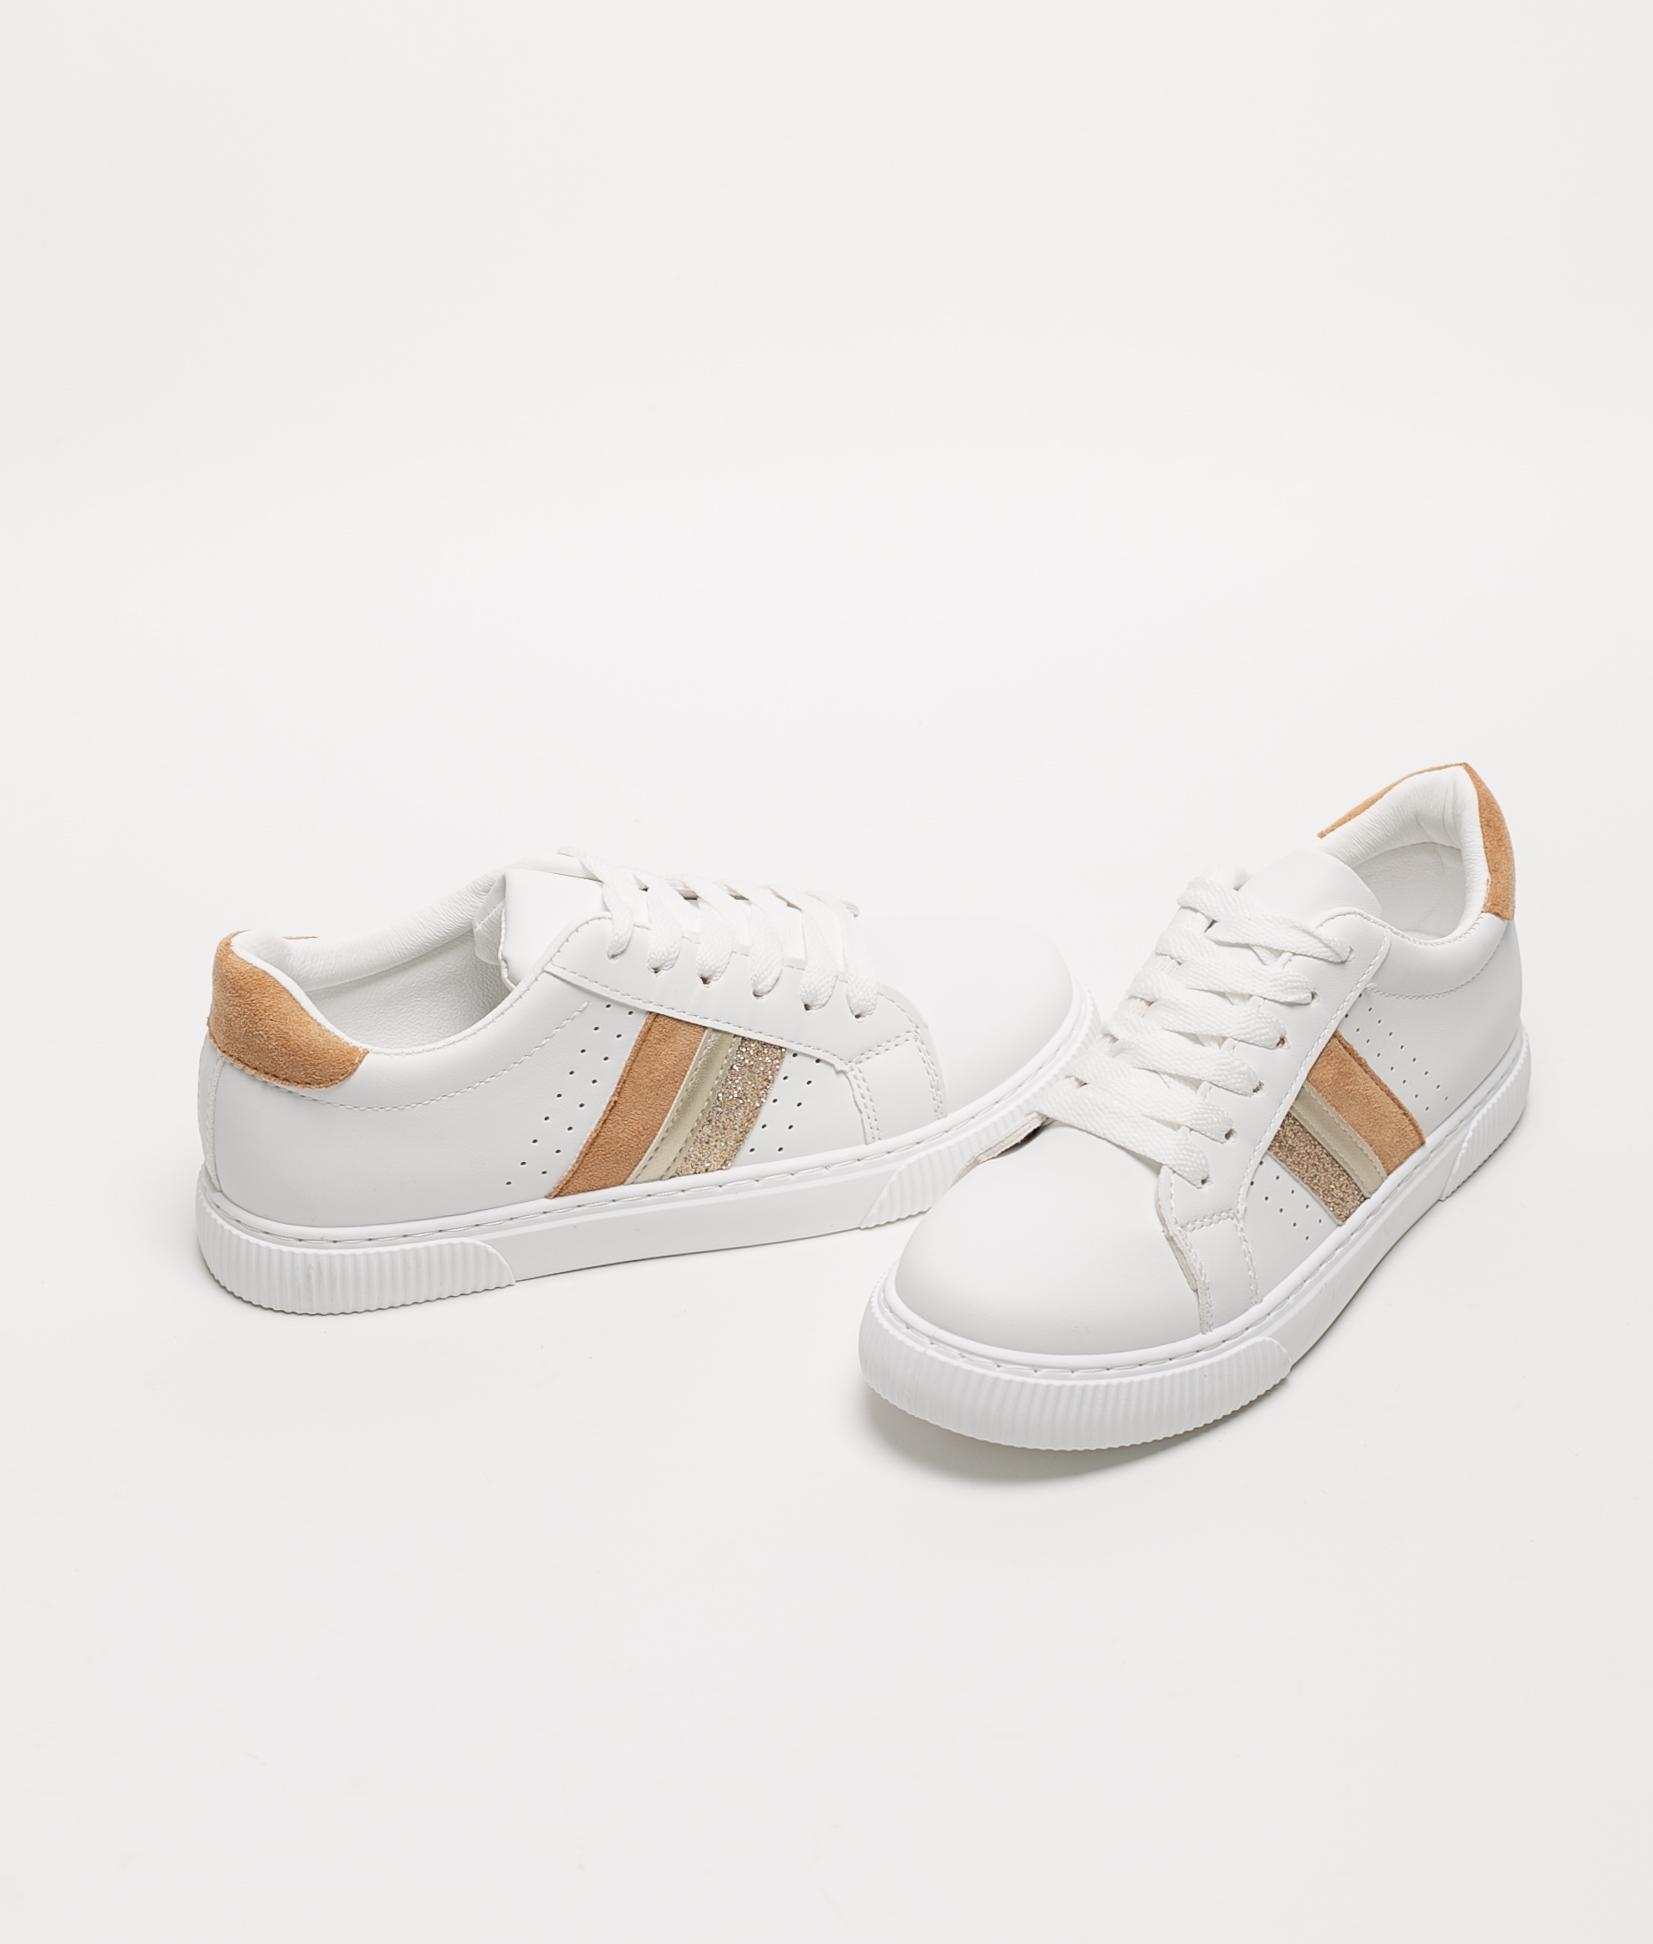 Sneakers PALTA - KAKI